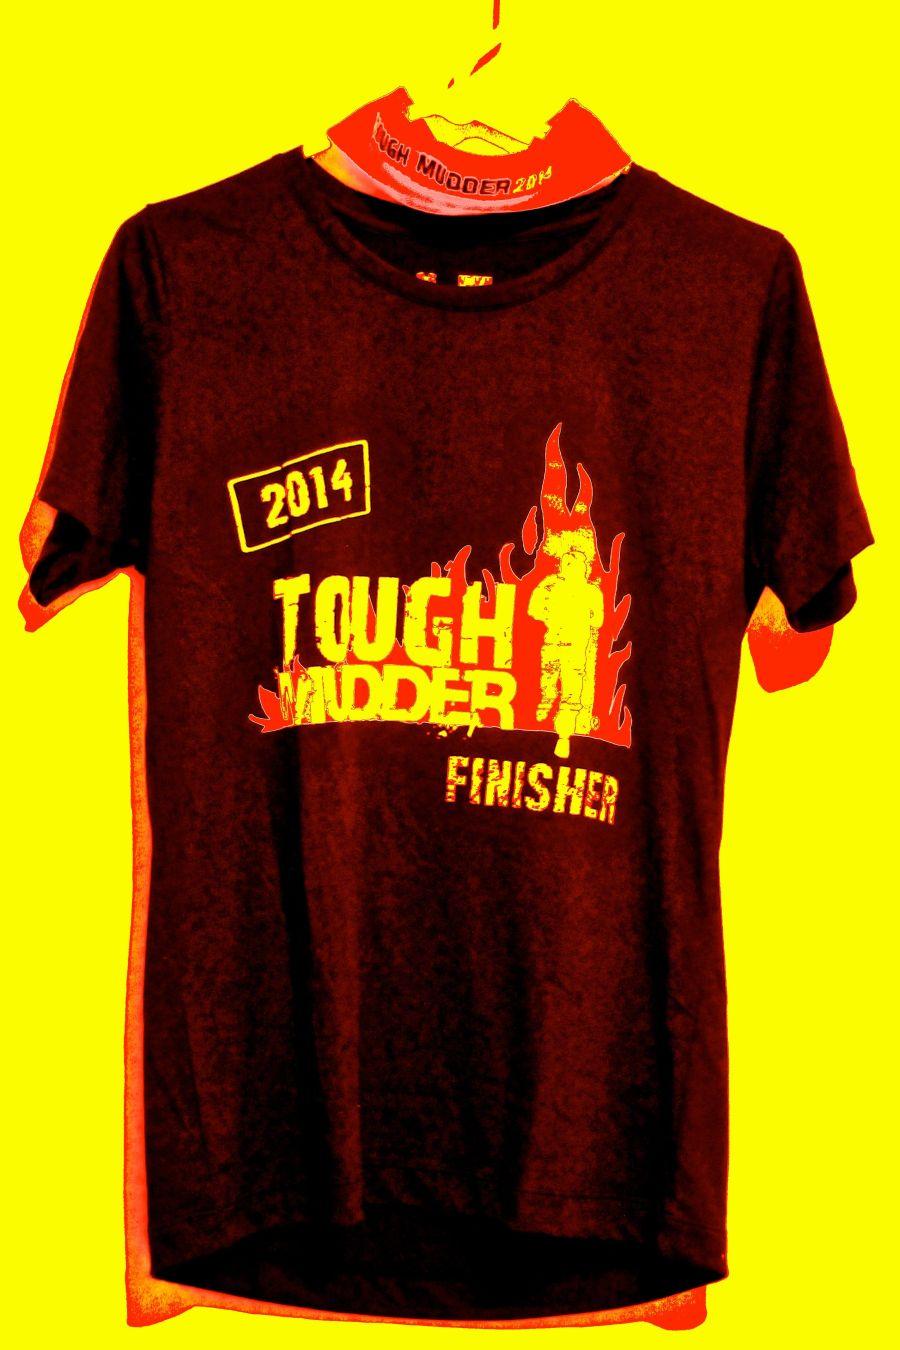 tough mudder finisher t-shirt